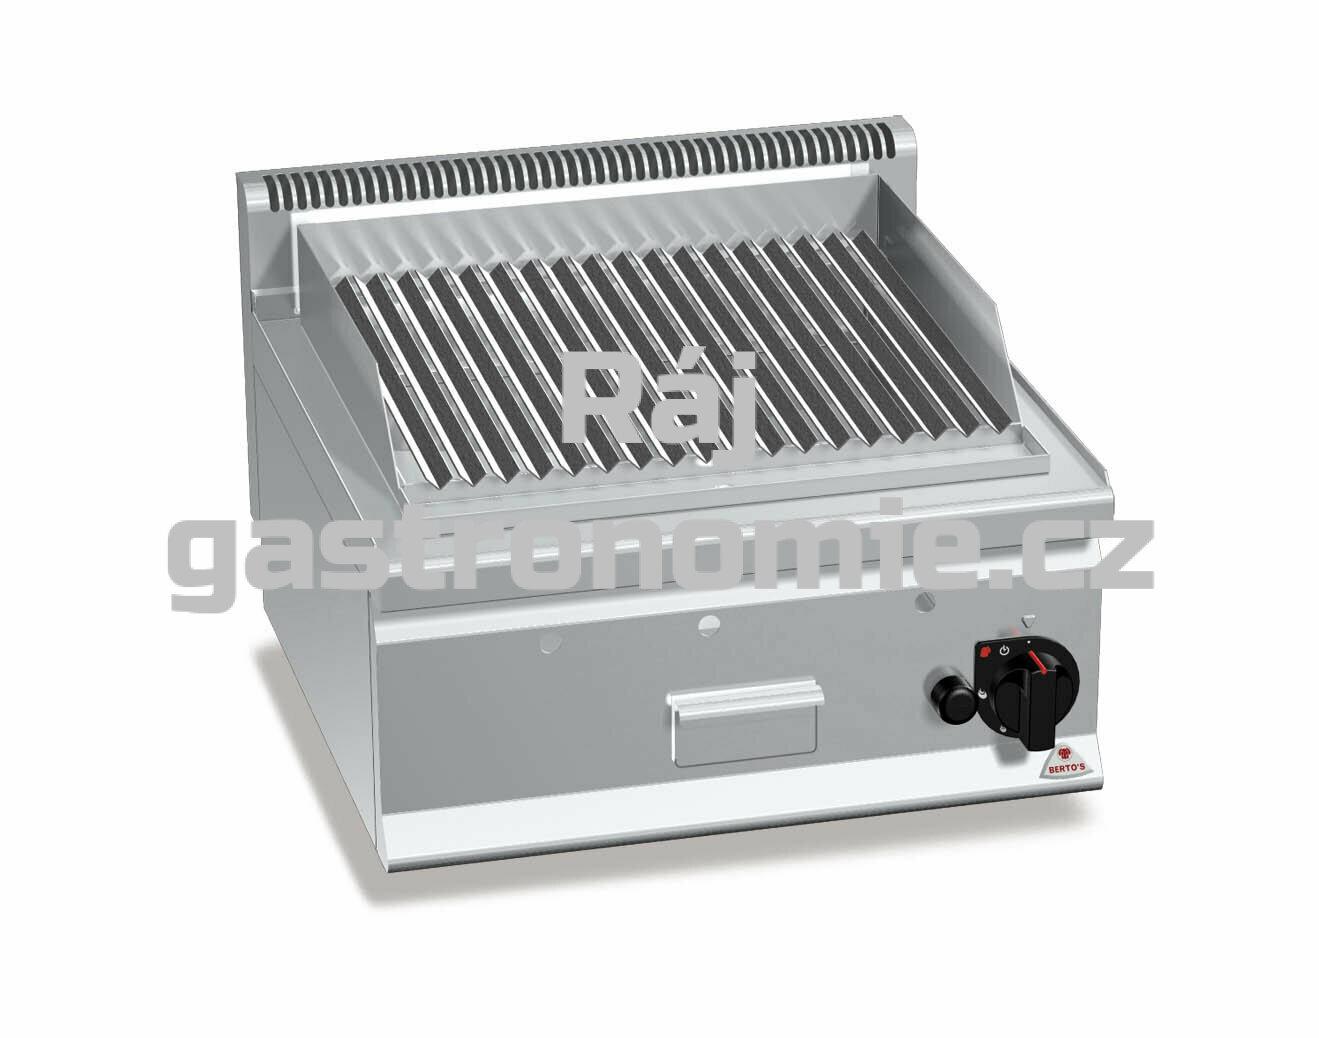 Lávový gril Bertos G6PL60B